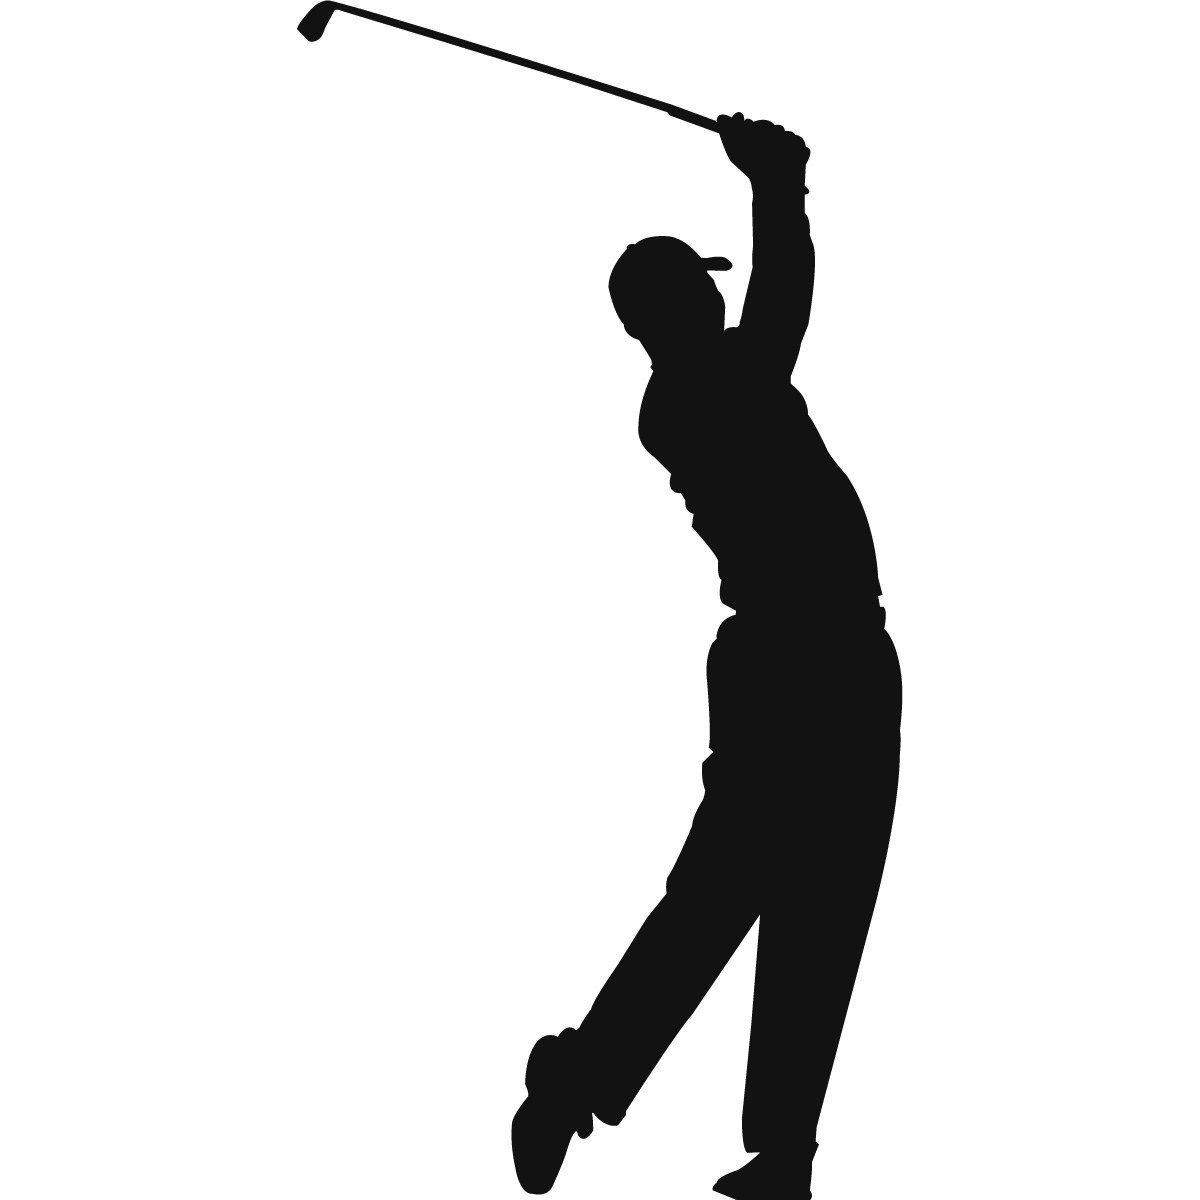 1200x1200 Golf Player Silhouette Golf Club Silhouette Clipart